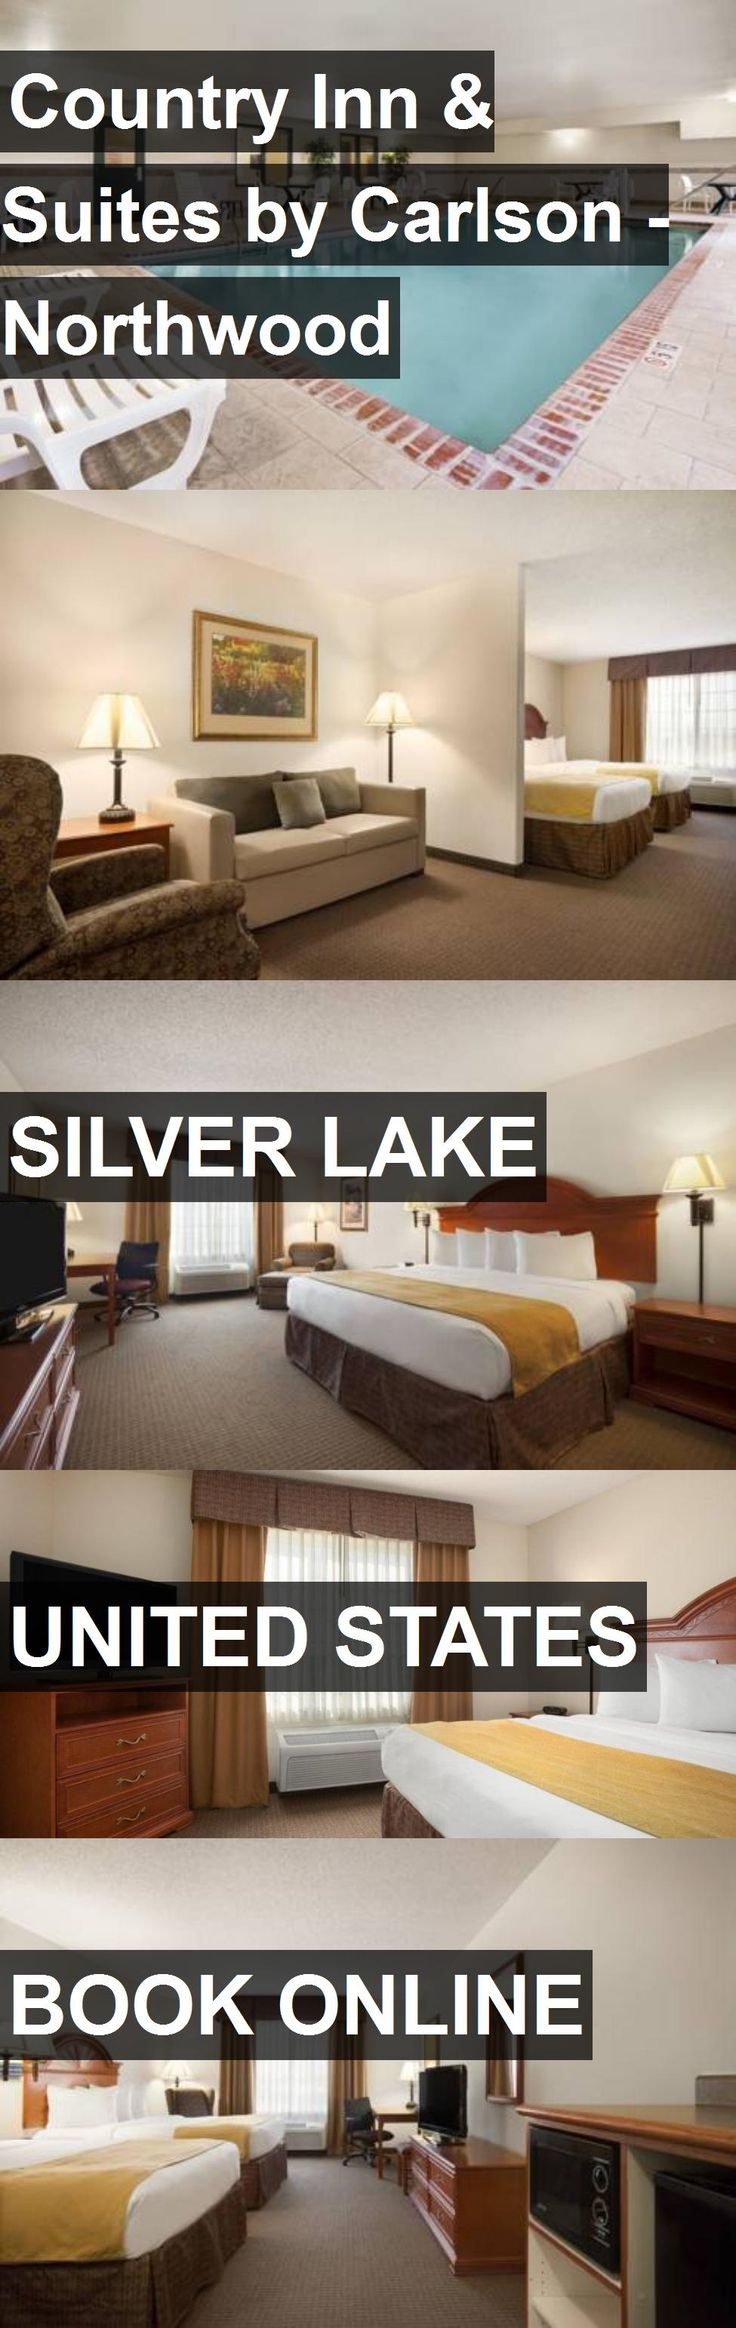 Hotel Country Inn